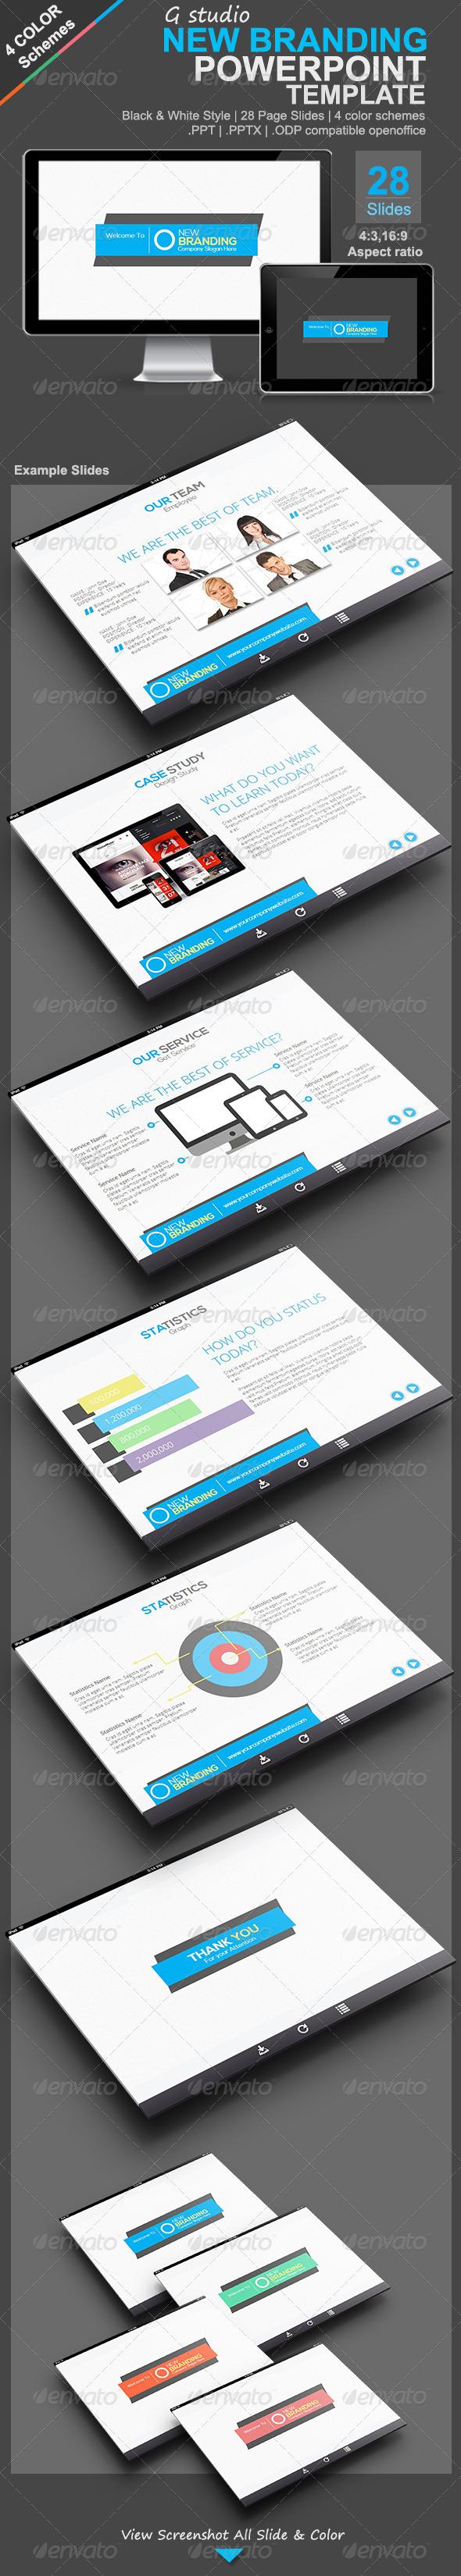 GraphicRiver Gstudio New Branding Presentation Template 4725398